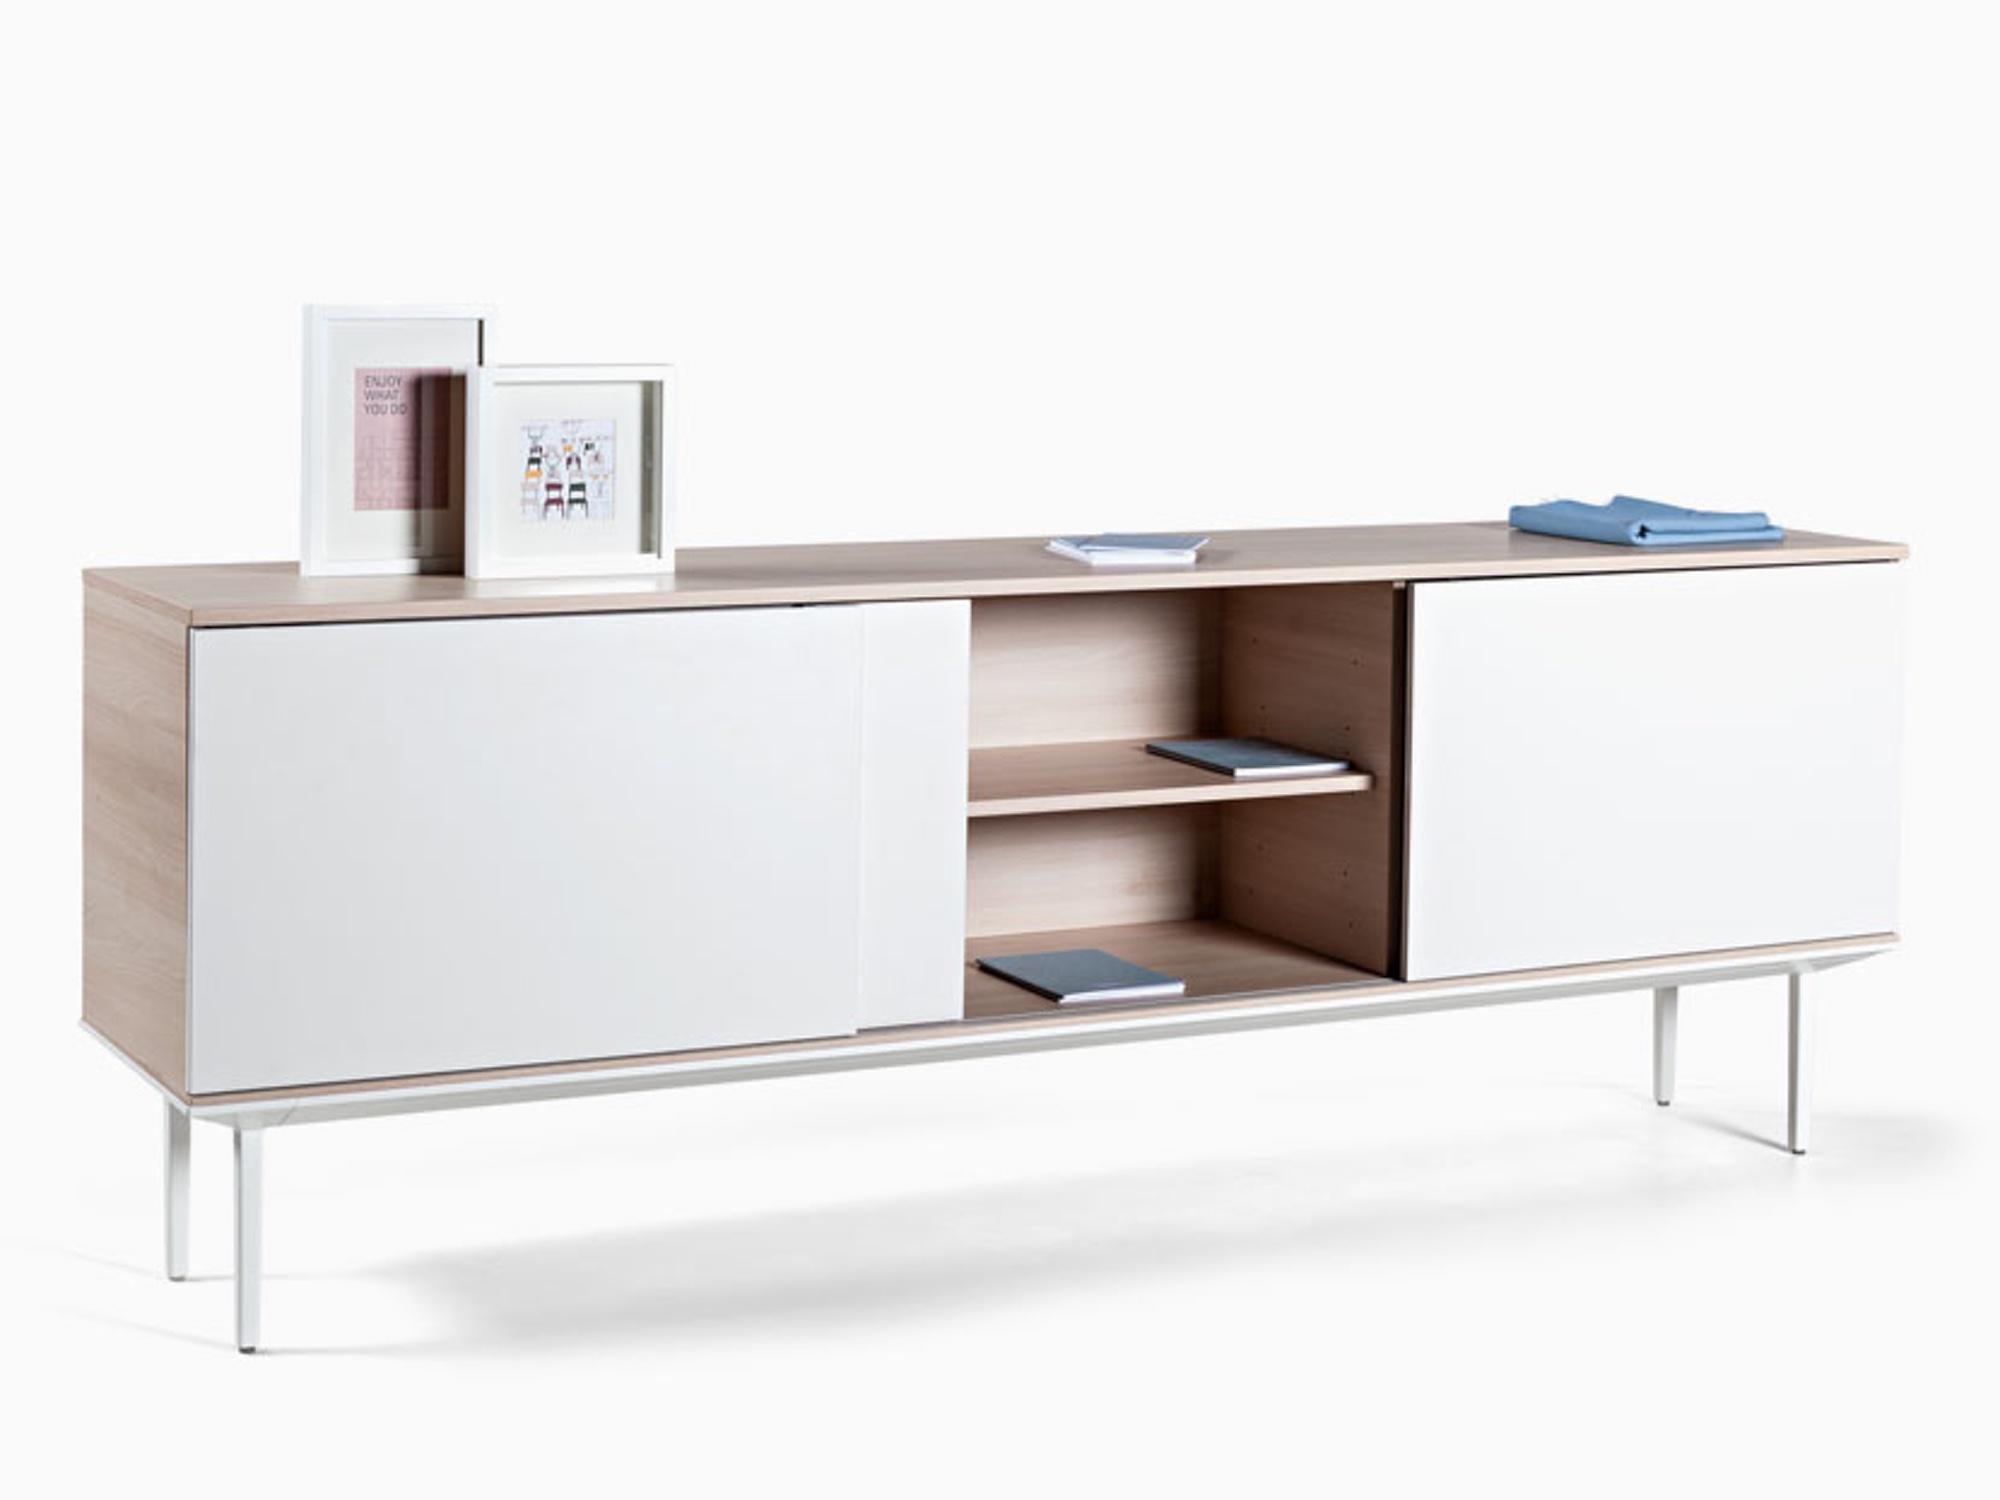 actiu longo lna22 sideboard eiche lime mit 3 schiebet ren in melamin sideboards b roschr nke. Black Bedroom Furniture Sets. Home Design Ideas